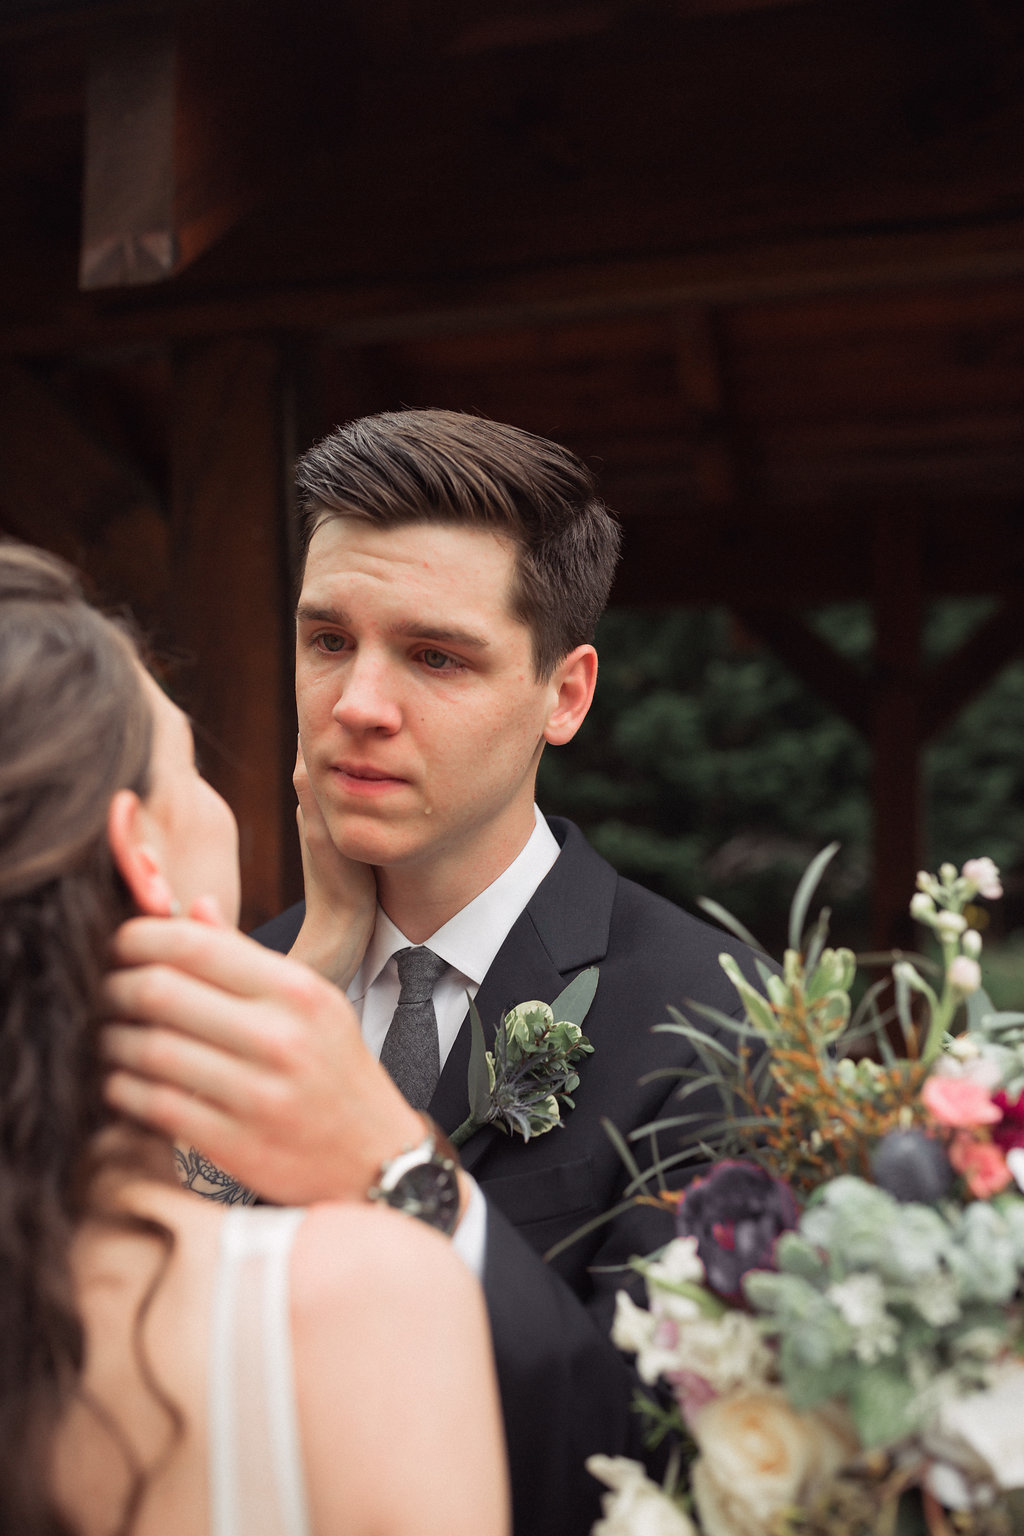 Honeysuckle-Hill-Weddings-Mallory-Patrick-61.jpg